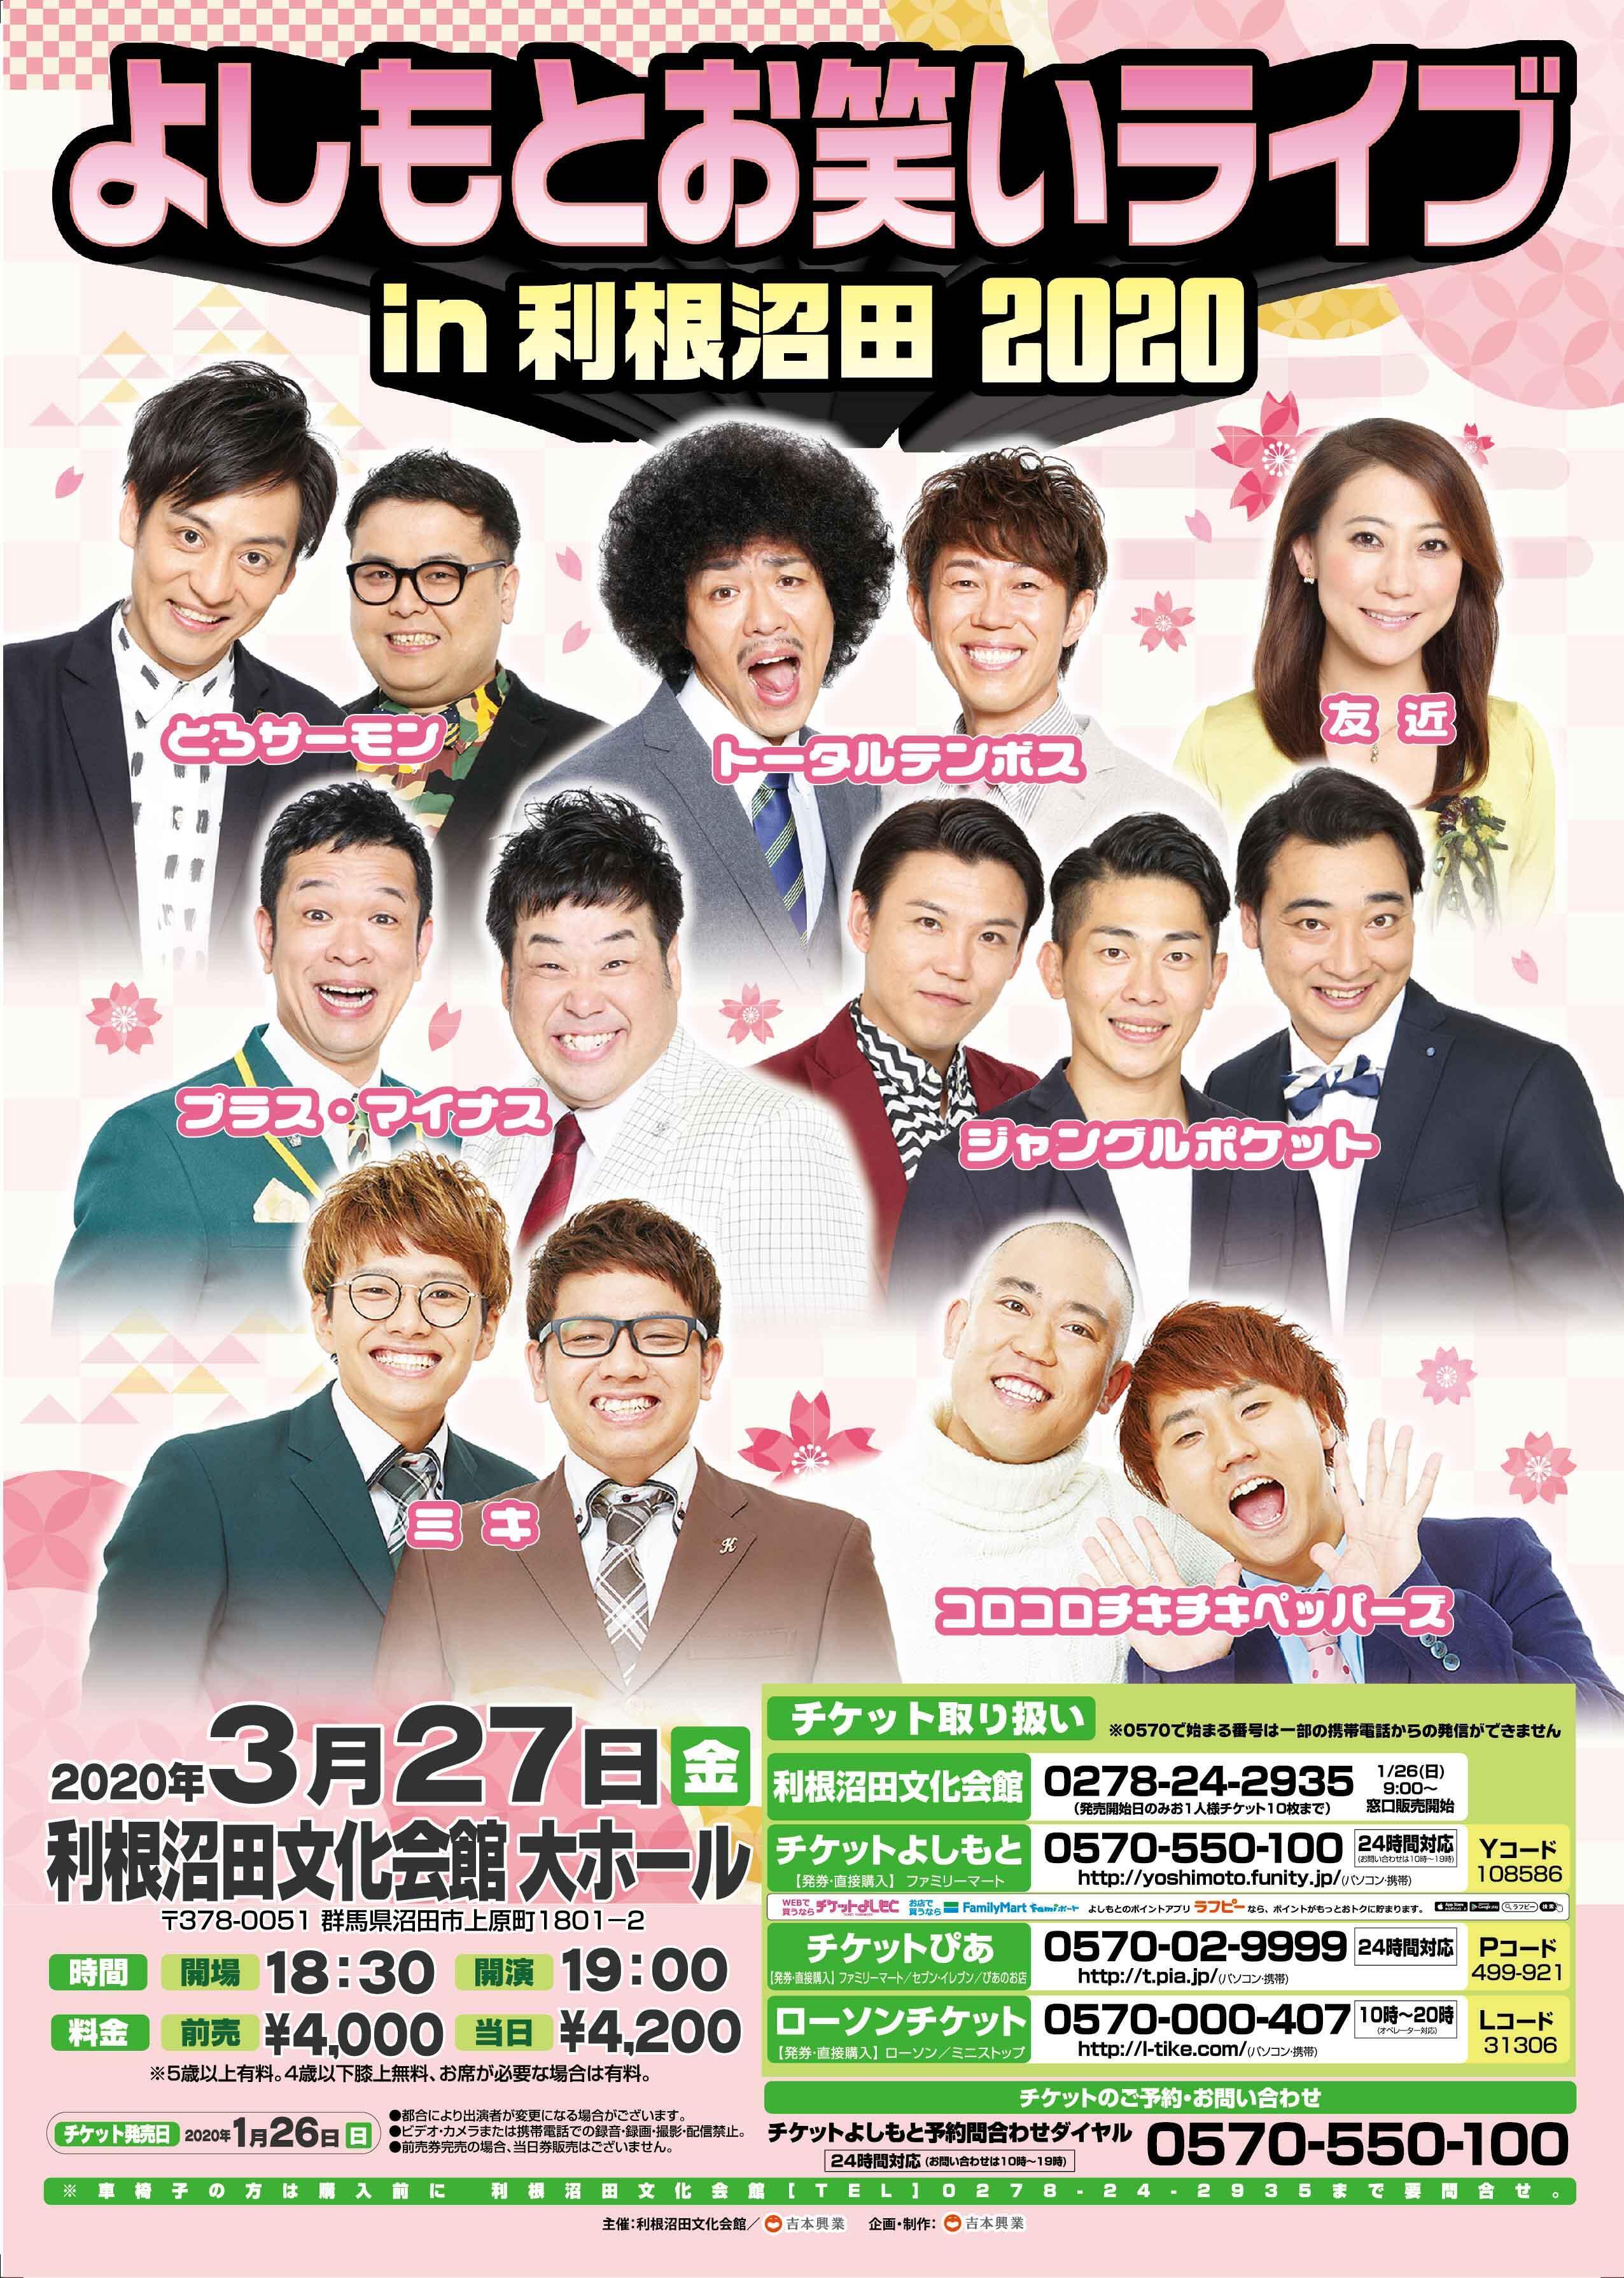 http://www.syumatsu.jp/20200117165253-2bc667913b7ea5d0dc1435482029bf0f48d1ae03.jpg